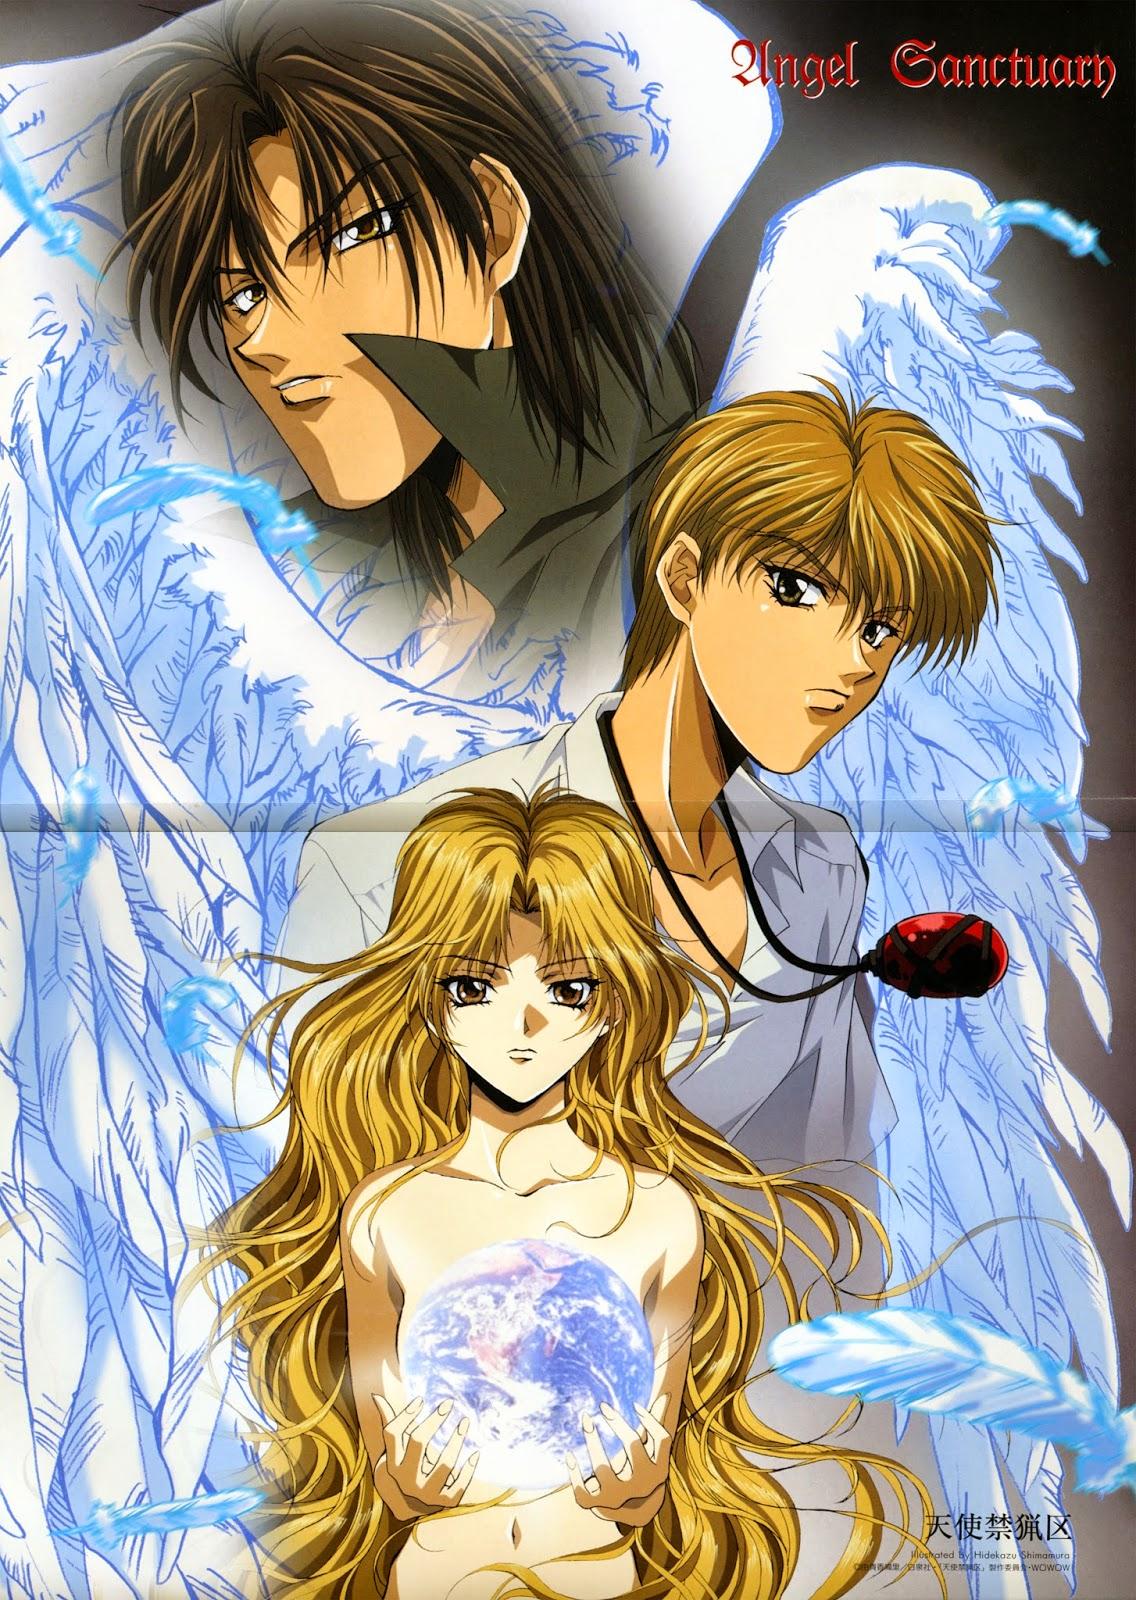 Moonlight Summoner S Anime Sekai Angel Sanctuary Ť©ä½¿ç¦çŒŸåŒº Tenshi Kinryōku